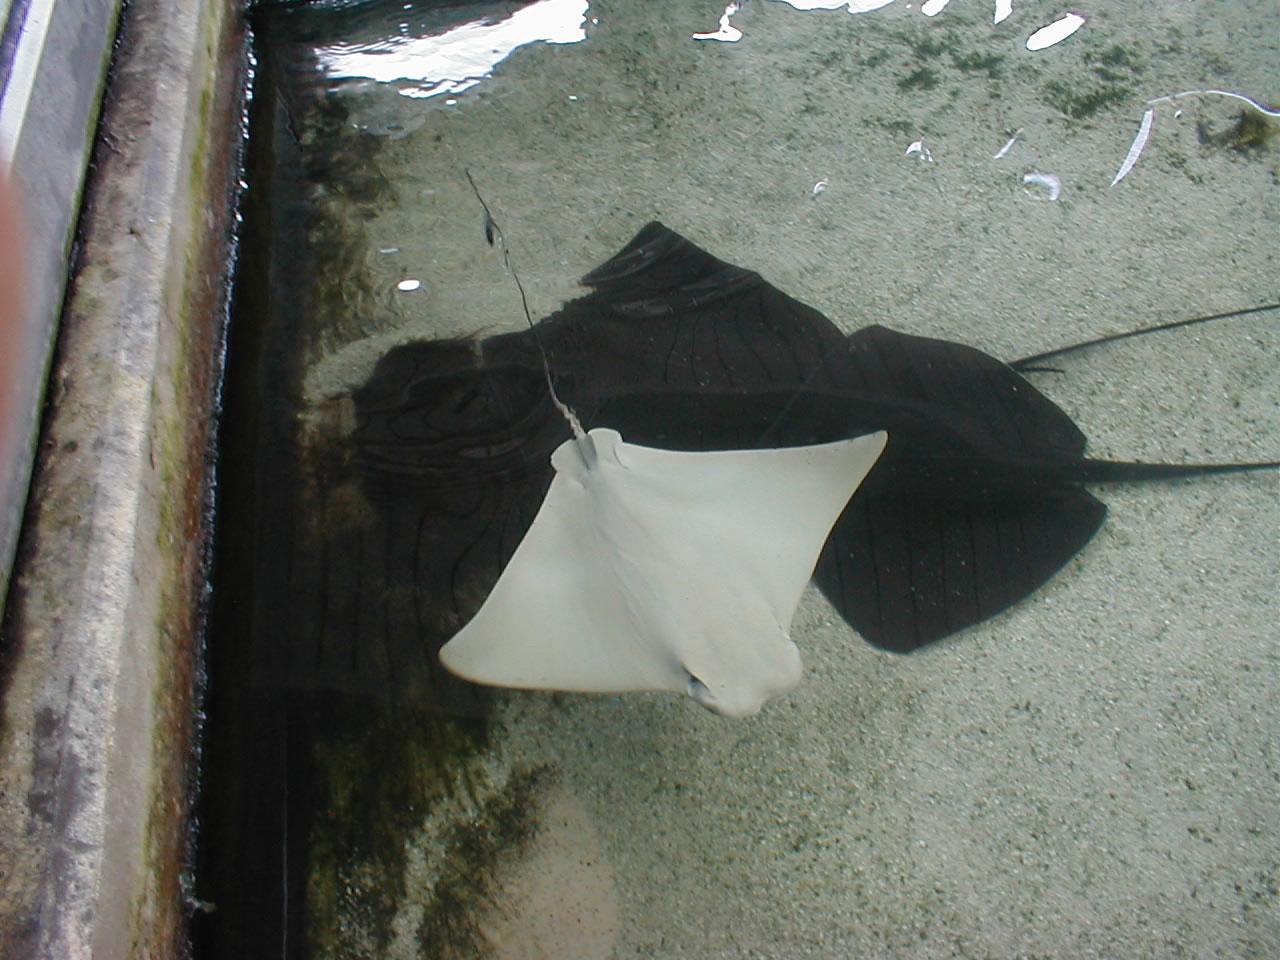 Autres animaux marins Albinos - Page 3 Seaworld%20Albino%20Stingray_jpg